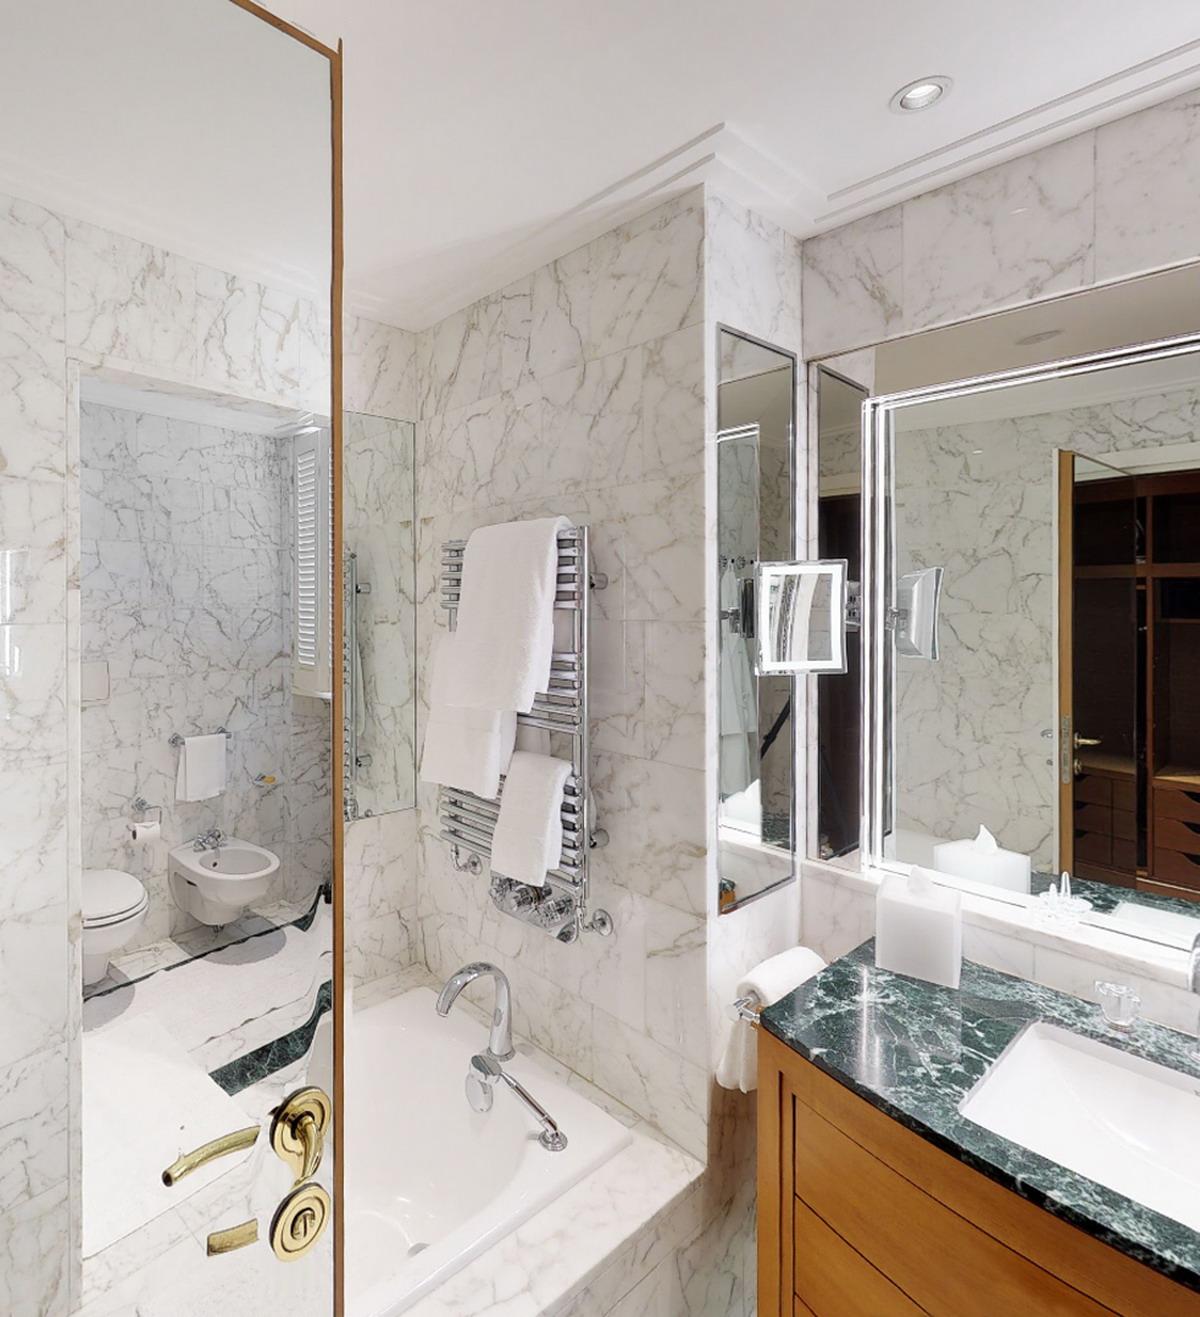 Hotel Four Season Milano - vasca e top in Marmo